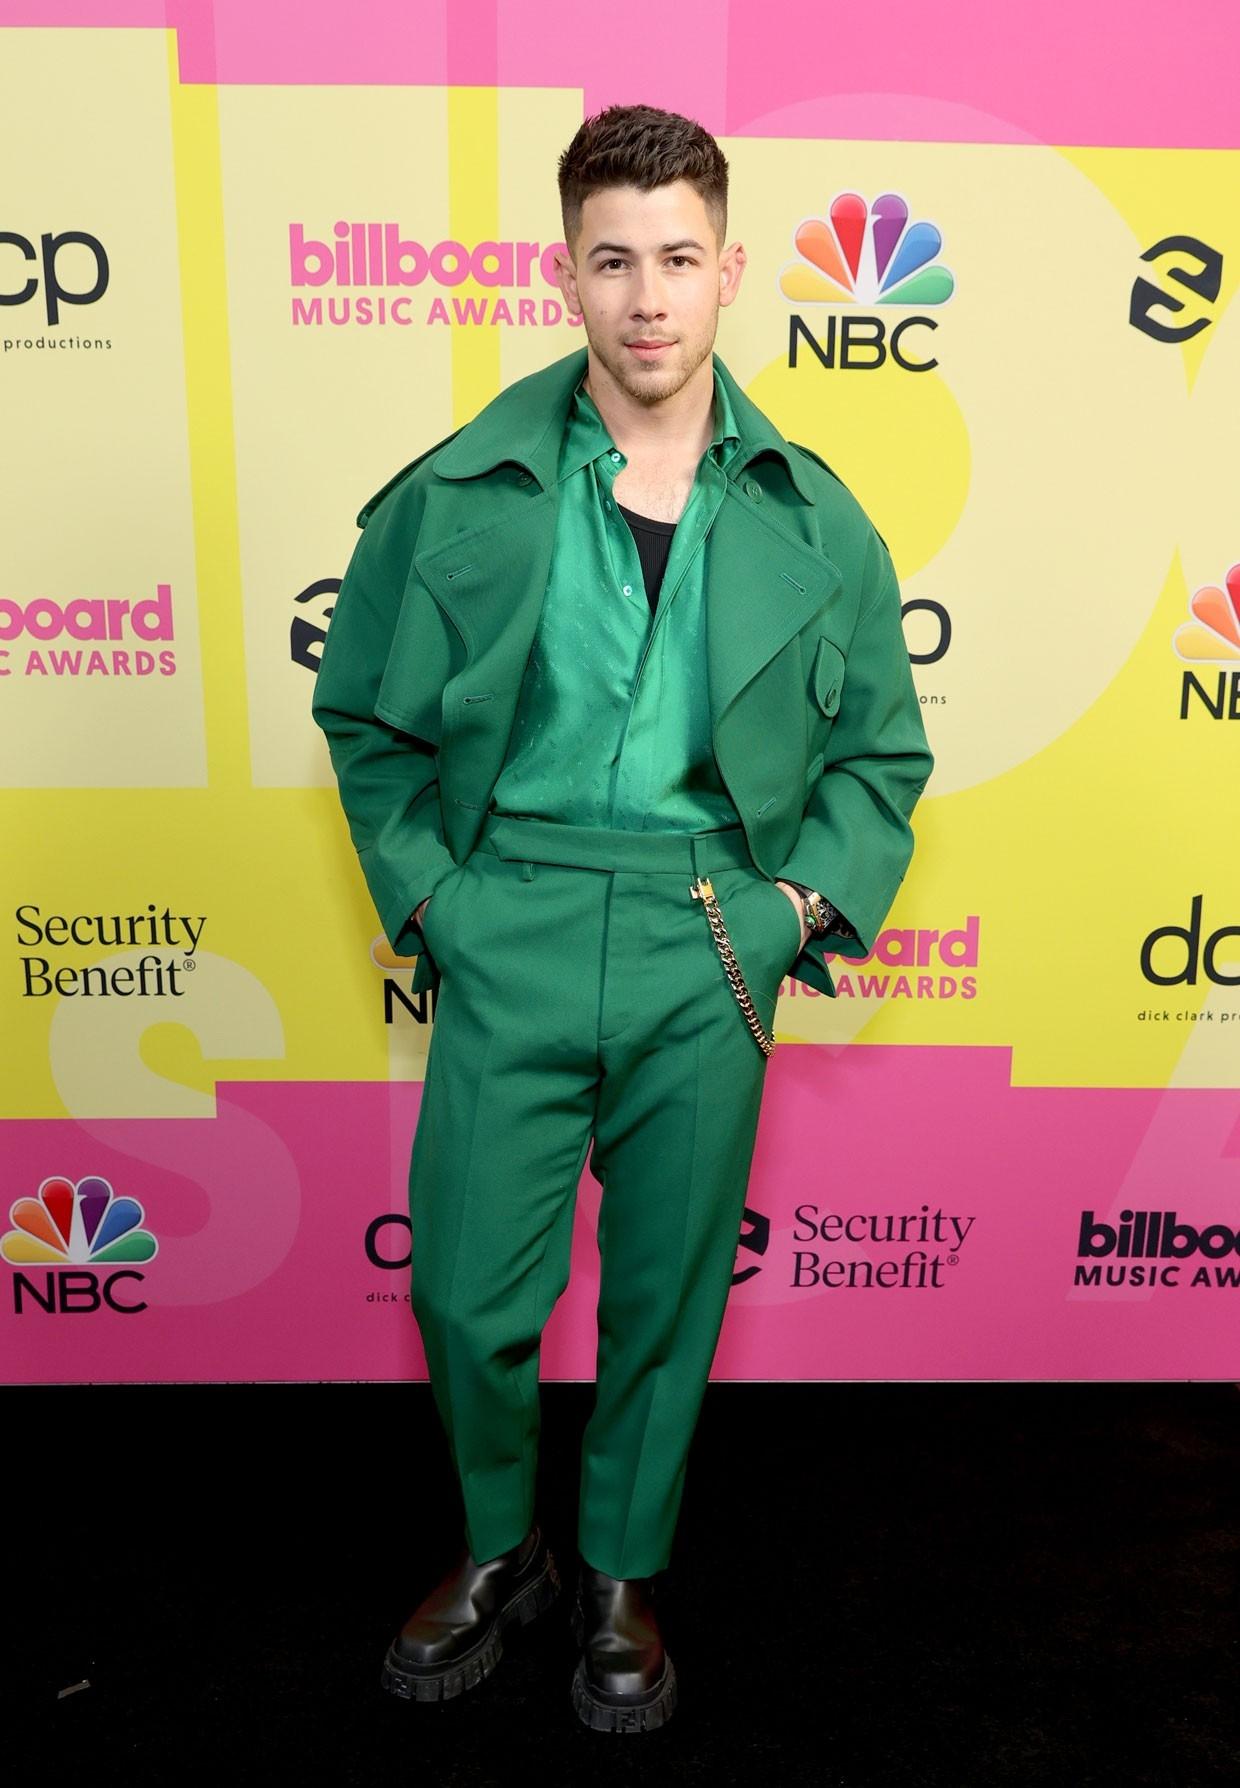 Billboard Music Awards 2021: Меган Фокс, Приянка Чопра, P!nk и другие на красной дорожке премии (ФОТО) - фото №2